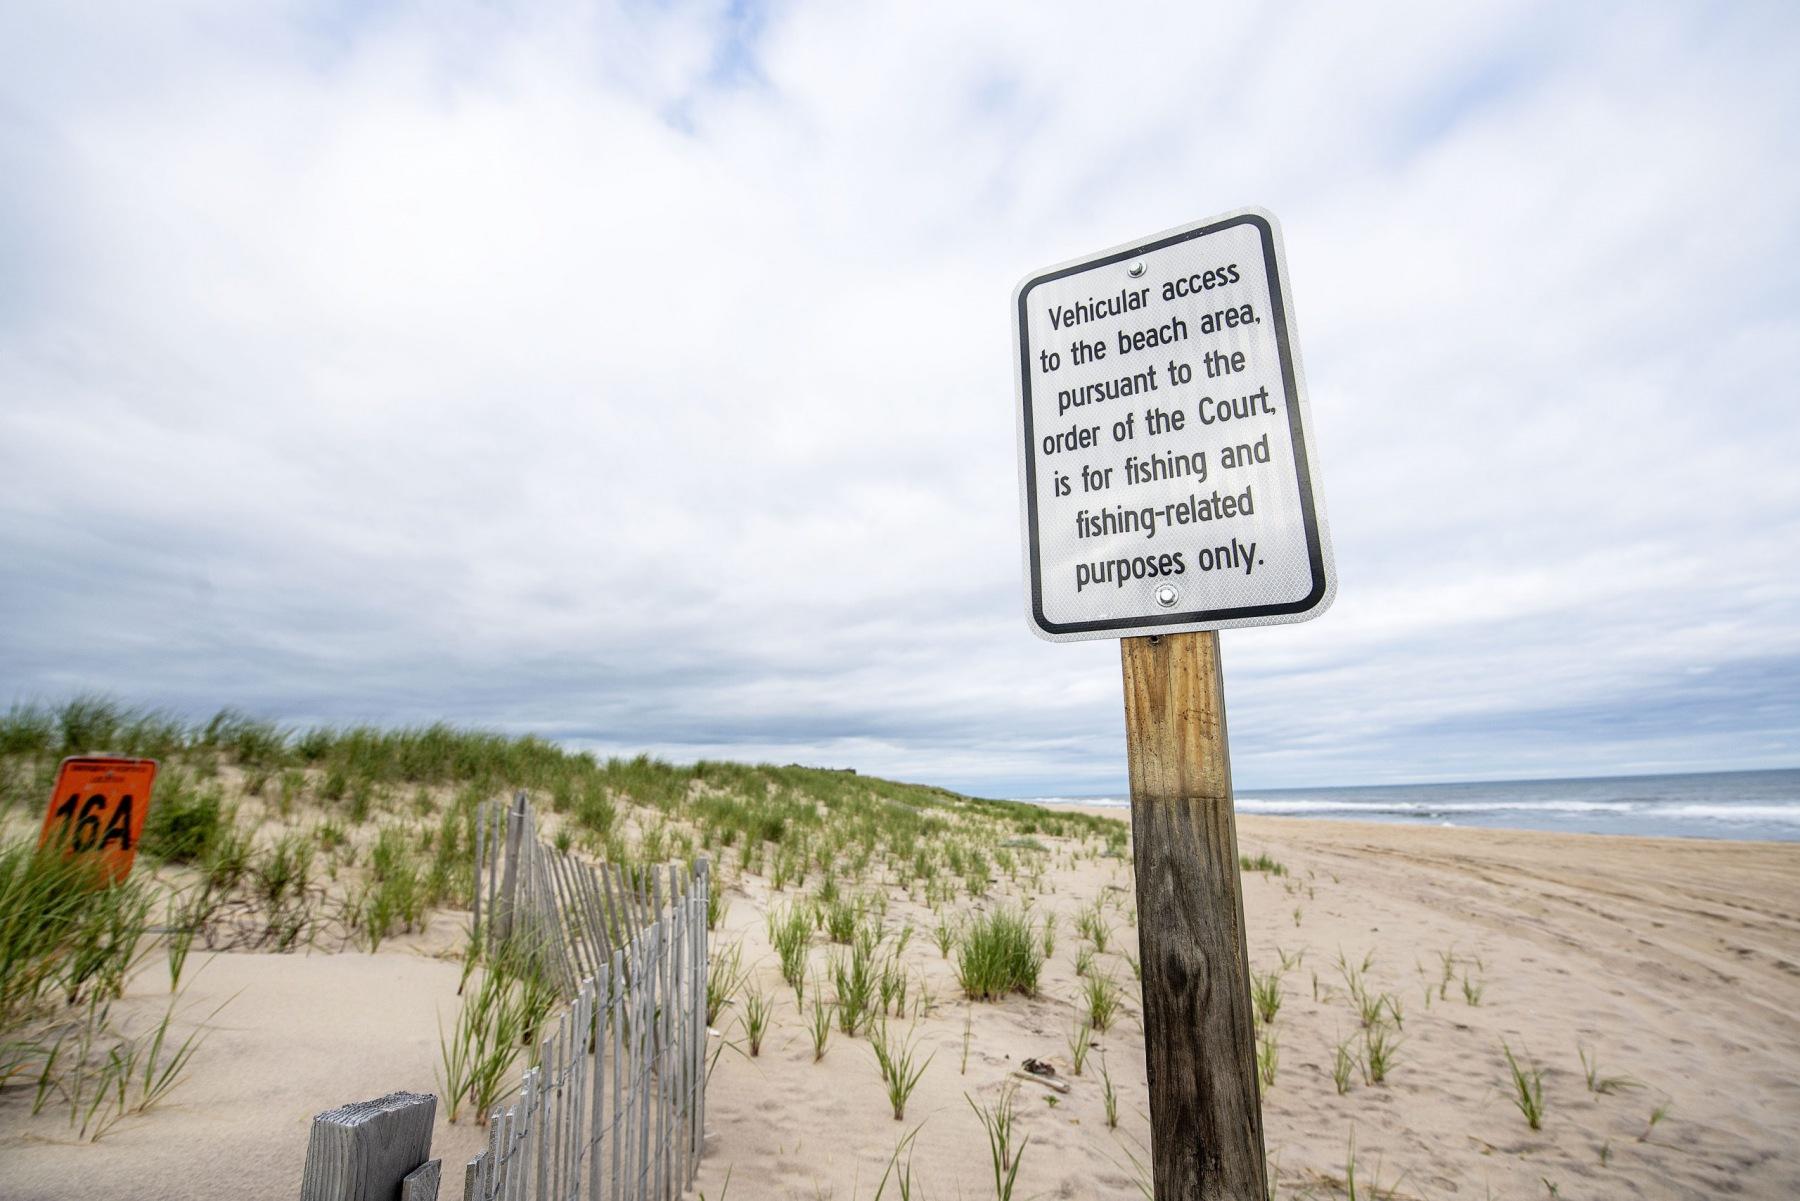 Truck-Beach-Access-Sign-053121_5847-scaled.jpg